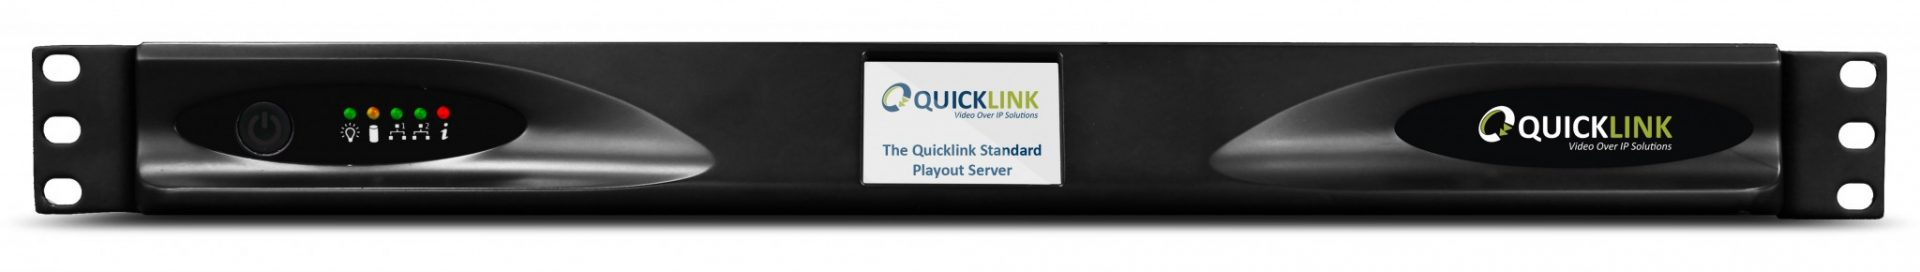 quicklink-standard-playout-server